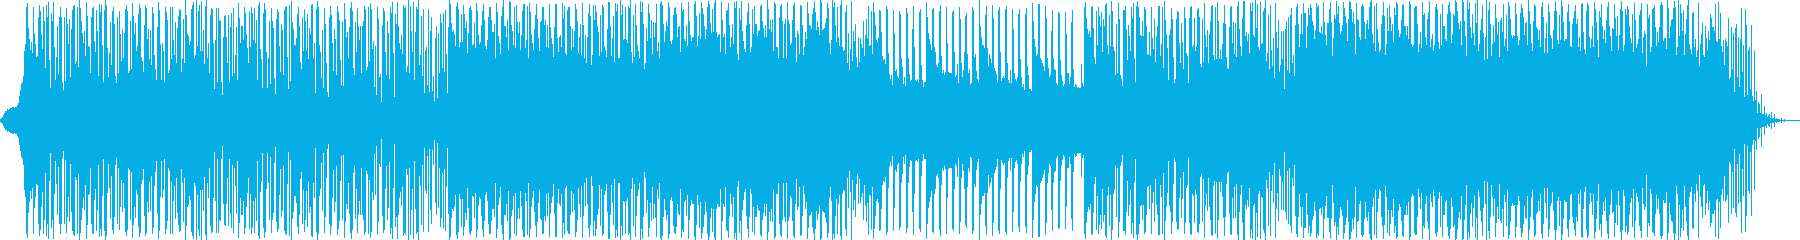 Move Slowlyの再生済みの波形